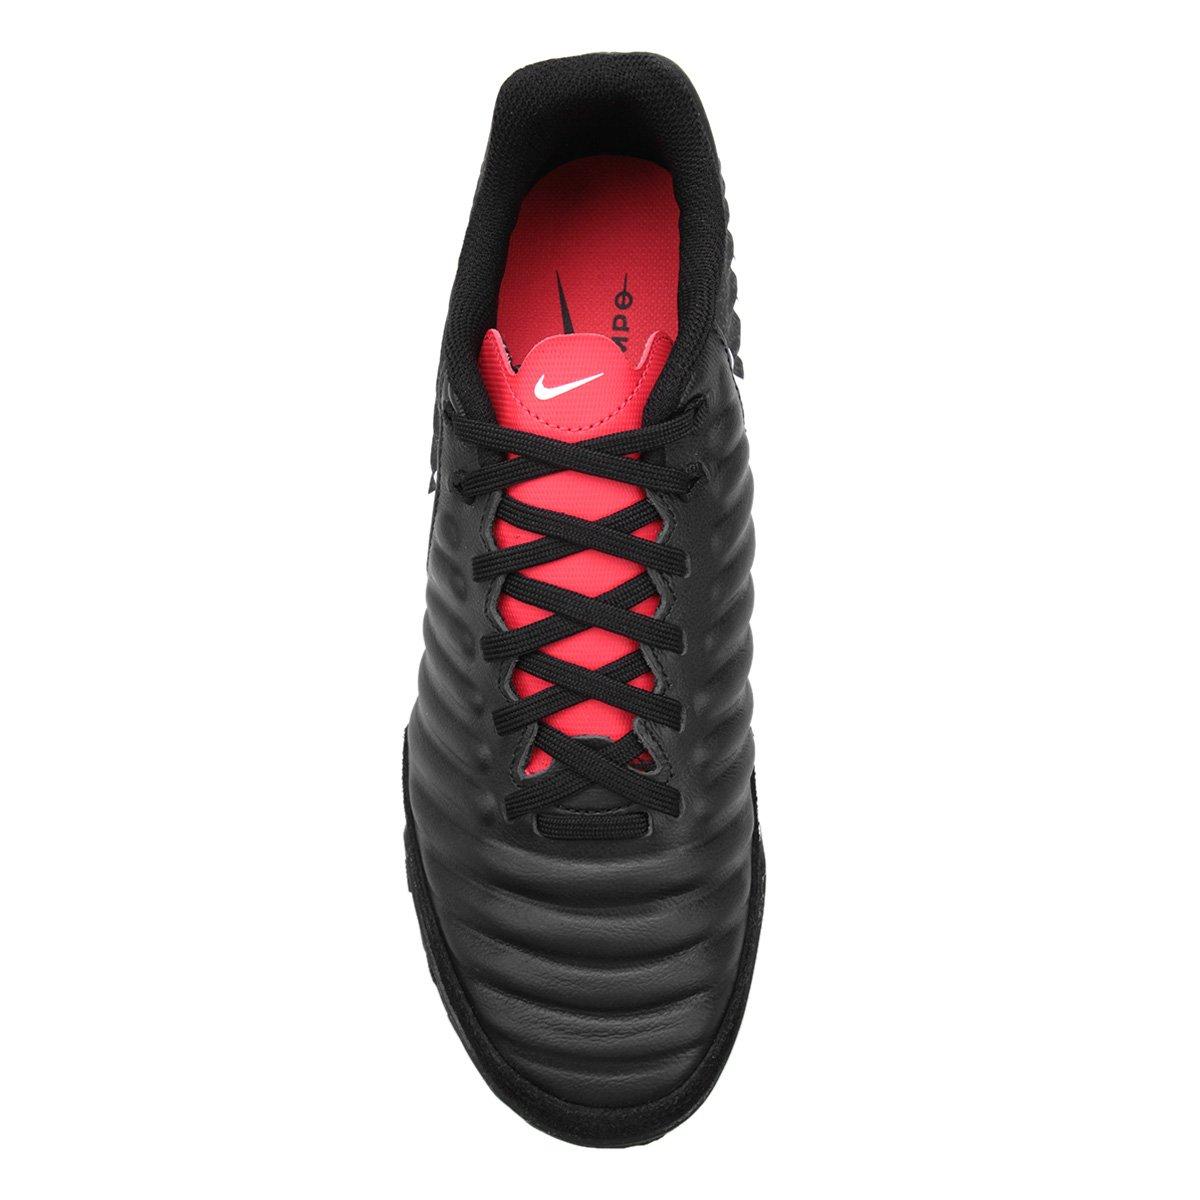 20cda0641f Chuteira Futsal Nike Tiempo Legend 7 Academy IC - Preto e Cinza ...